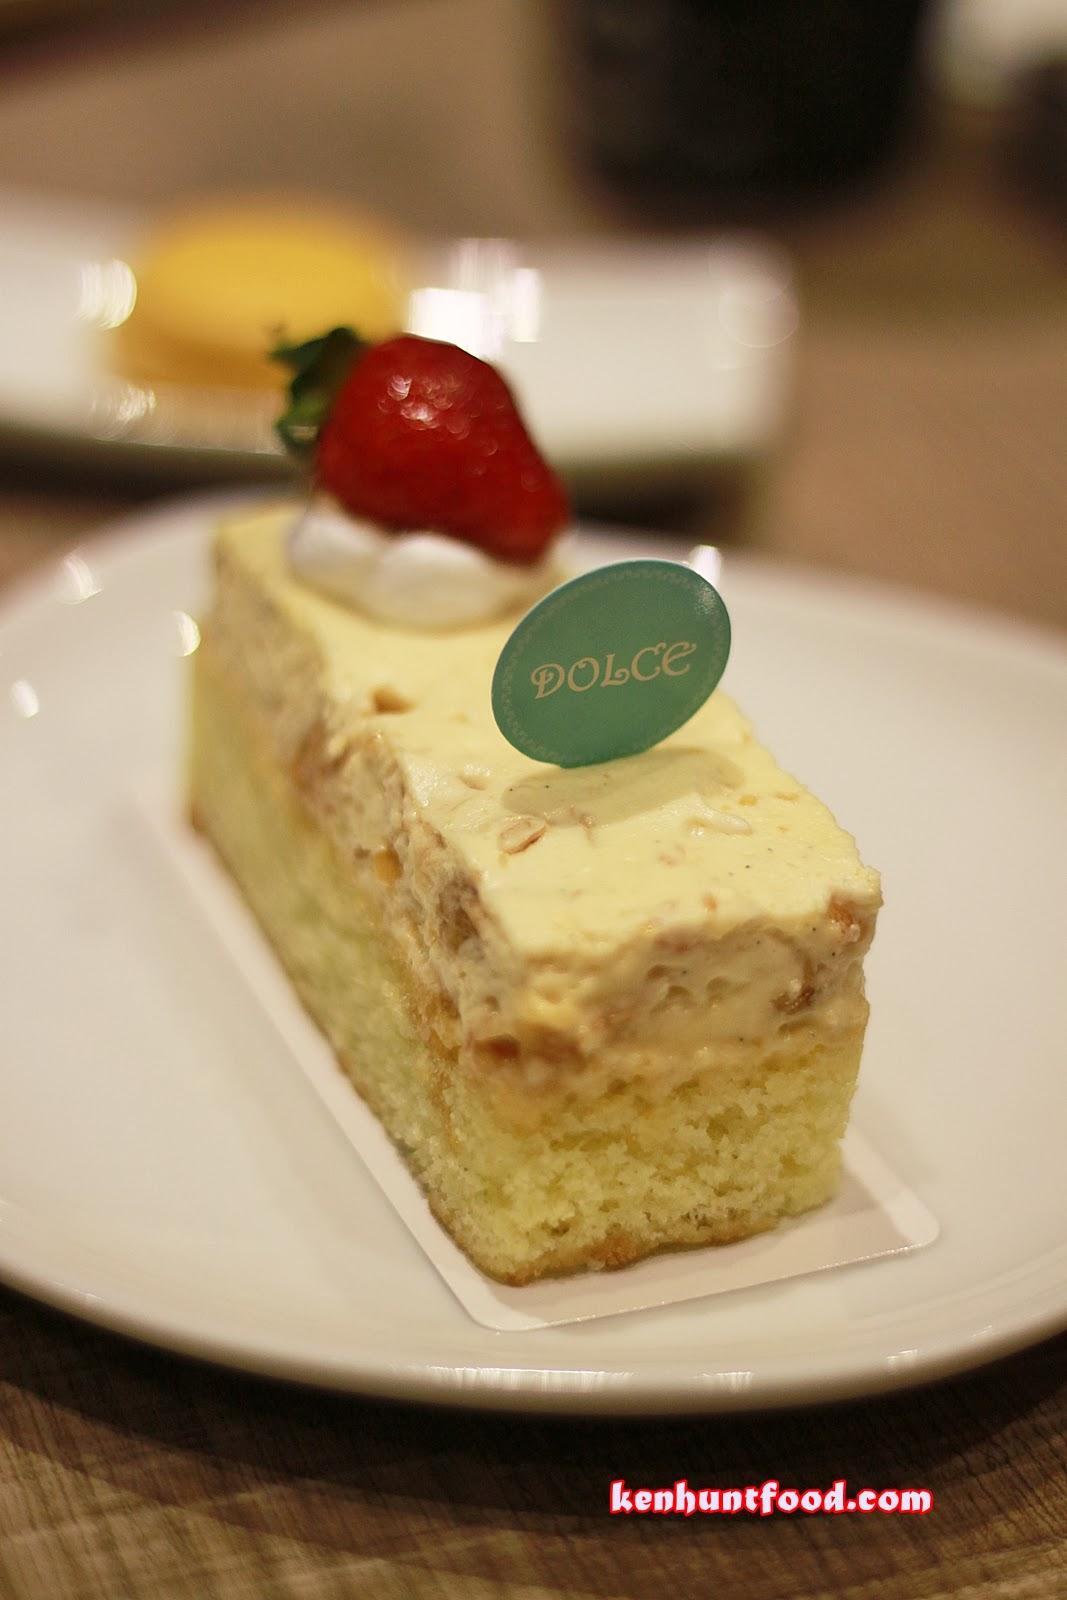 Dolce Dessert Cafe is located strategically at Jalan Kek Chuan 8f25ee5e0ec6